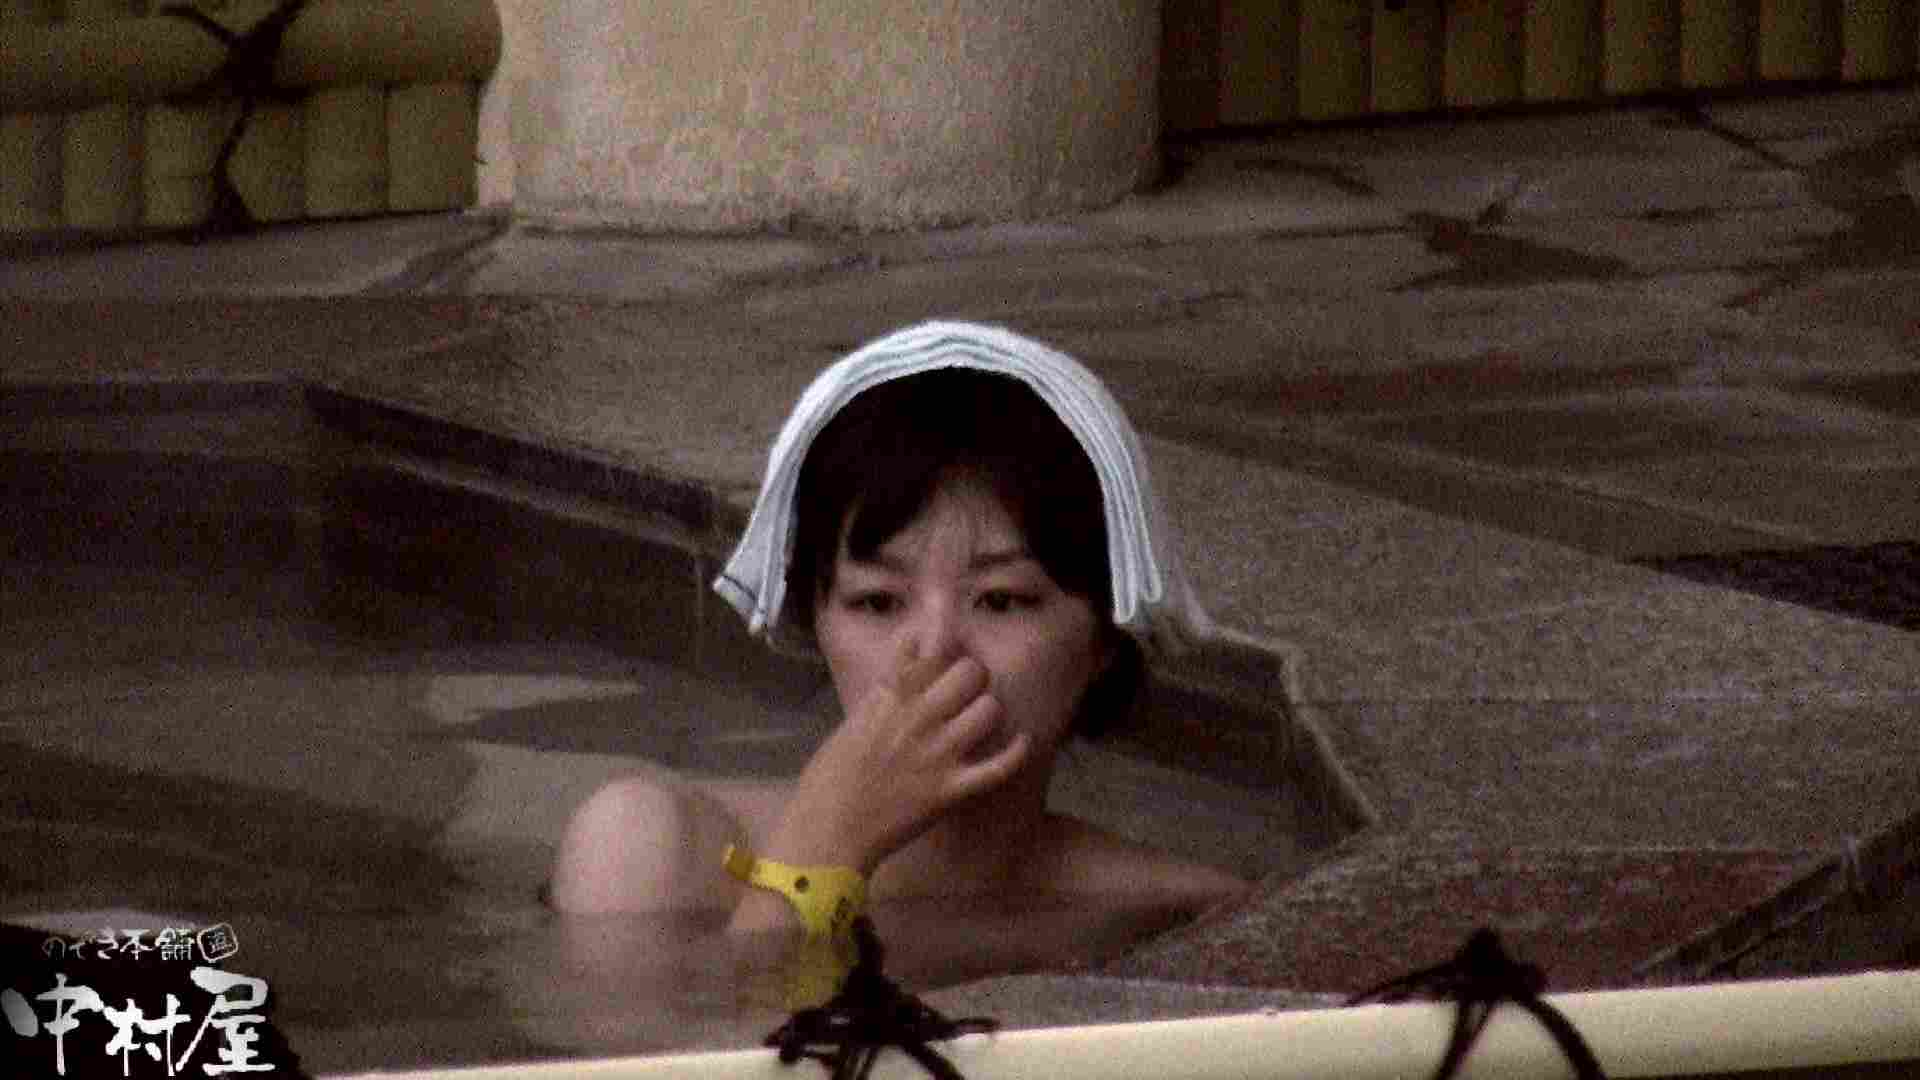 Aquaな露天風呂Vol.916 いやらしいOL | 0  75連発 37